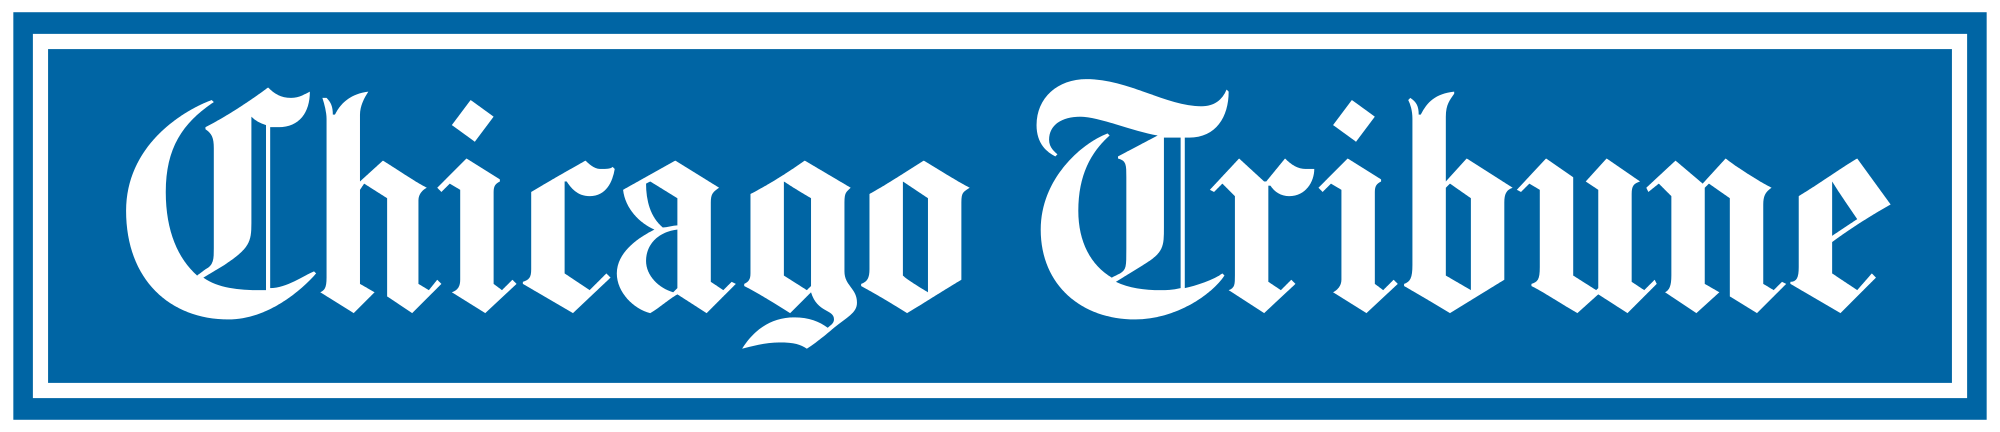 Chicago Tribune Blue Logo.png